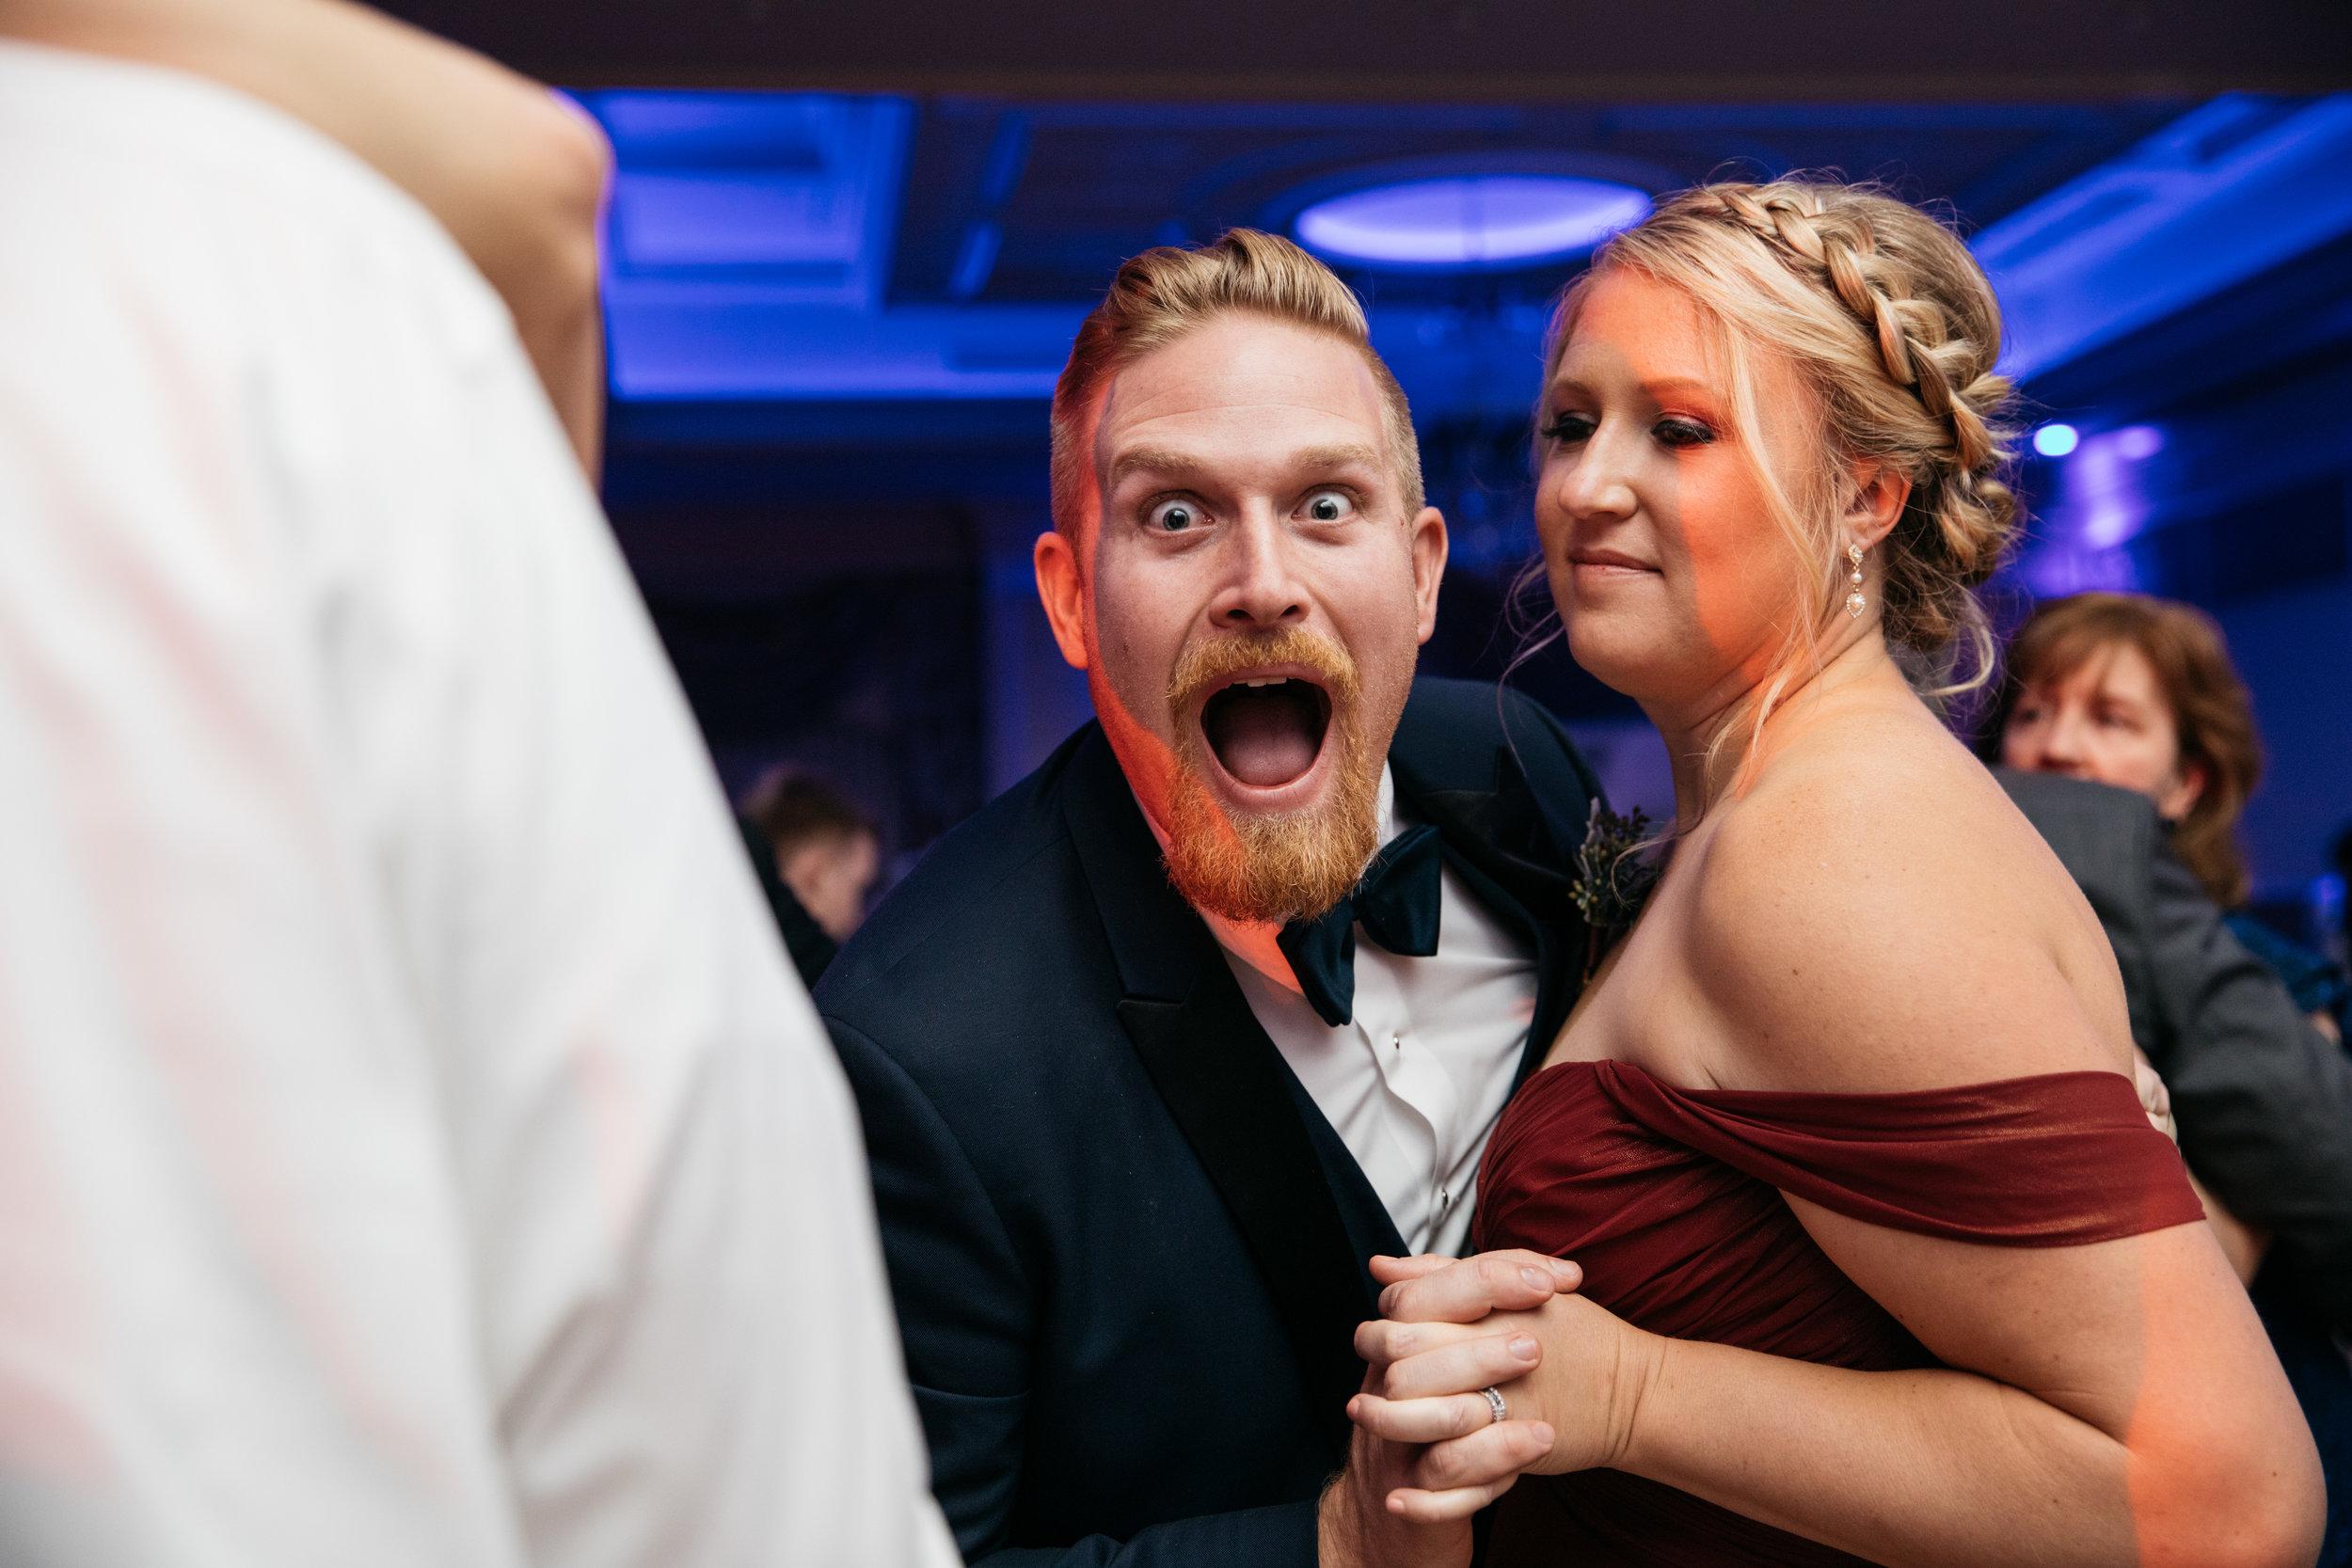 WeddingPhotos | NJPhotographer | Highlights-16-7.jpg